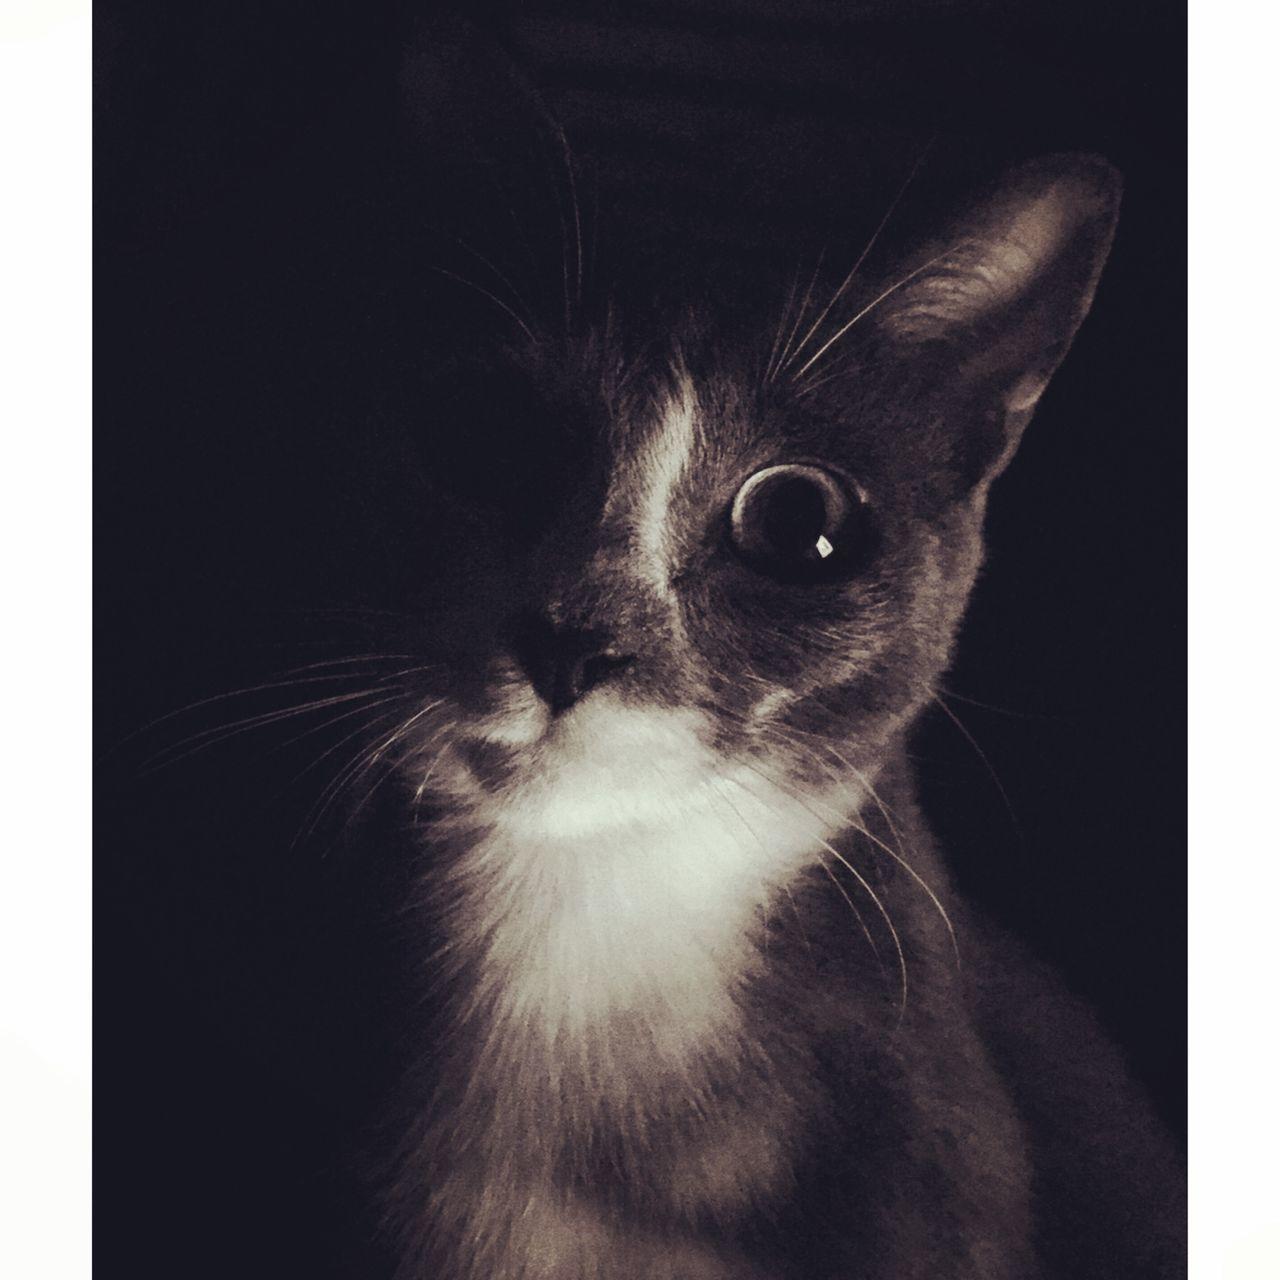 domestic cat, pets, one animal, mammal, animal themes, studio shot, domestic animals, no people, feline, close-up, indoors, black background, day